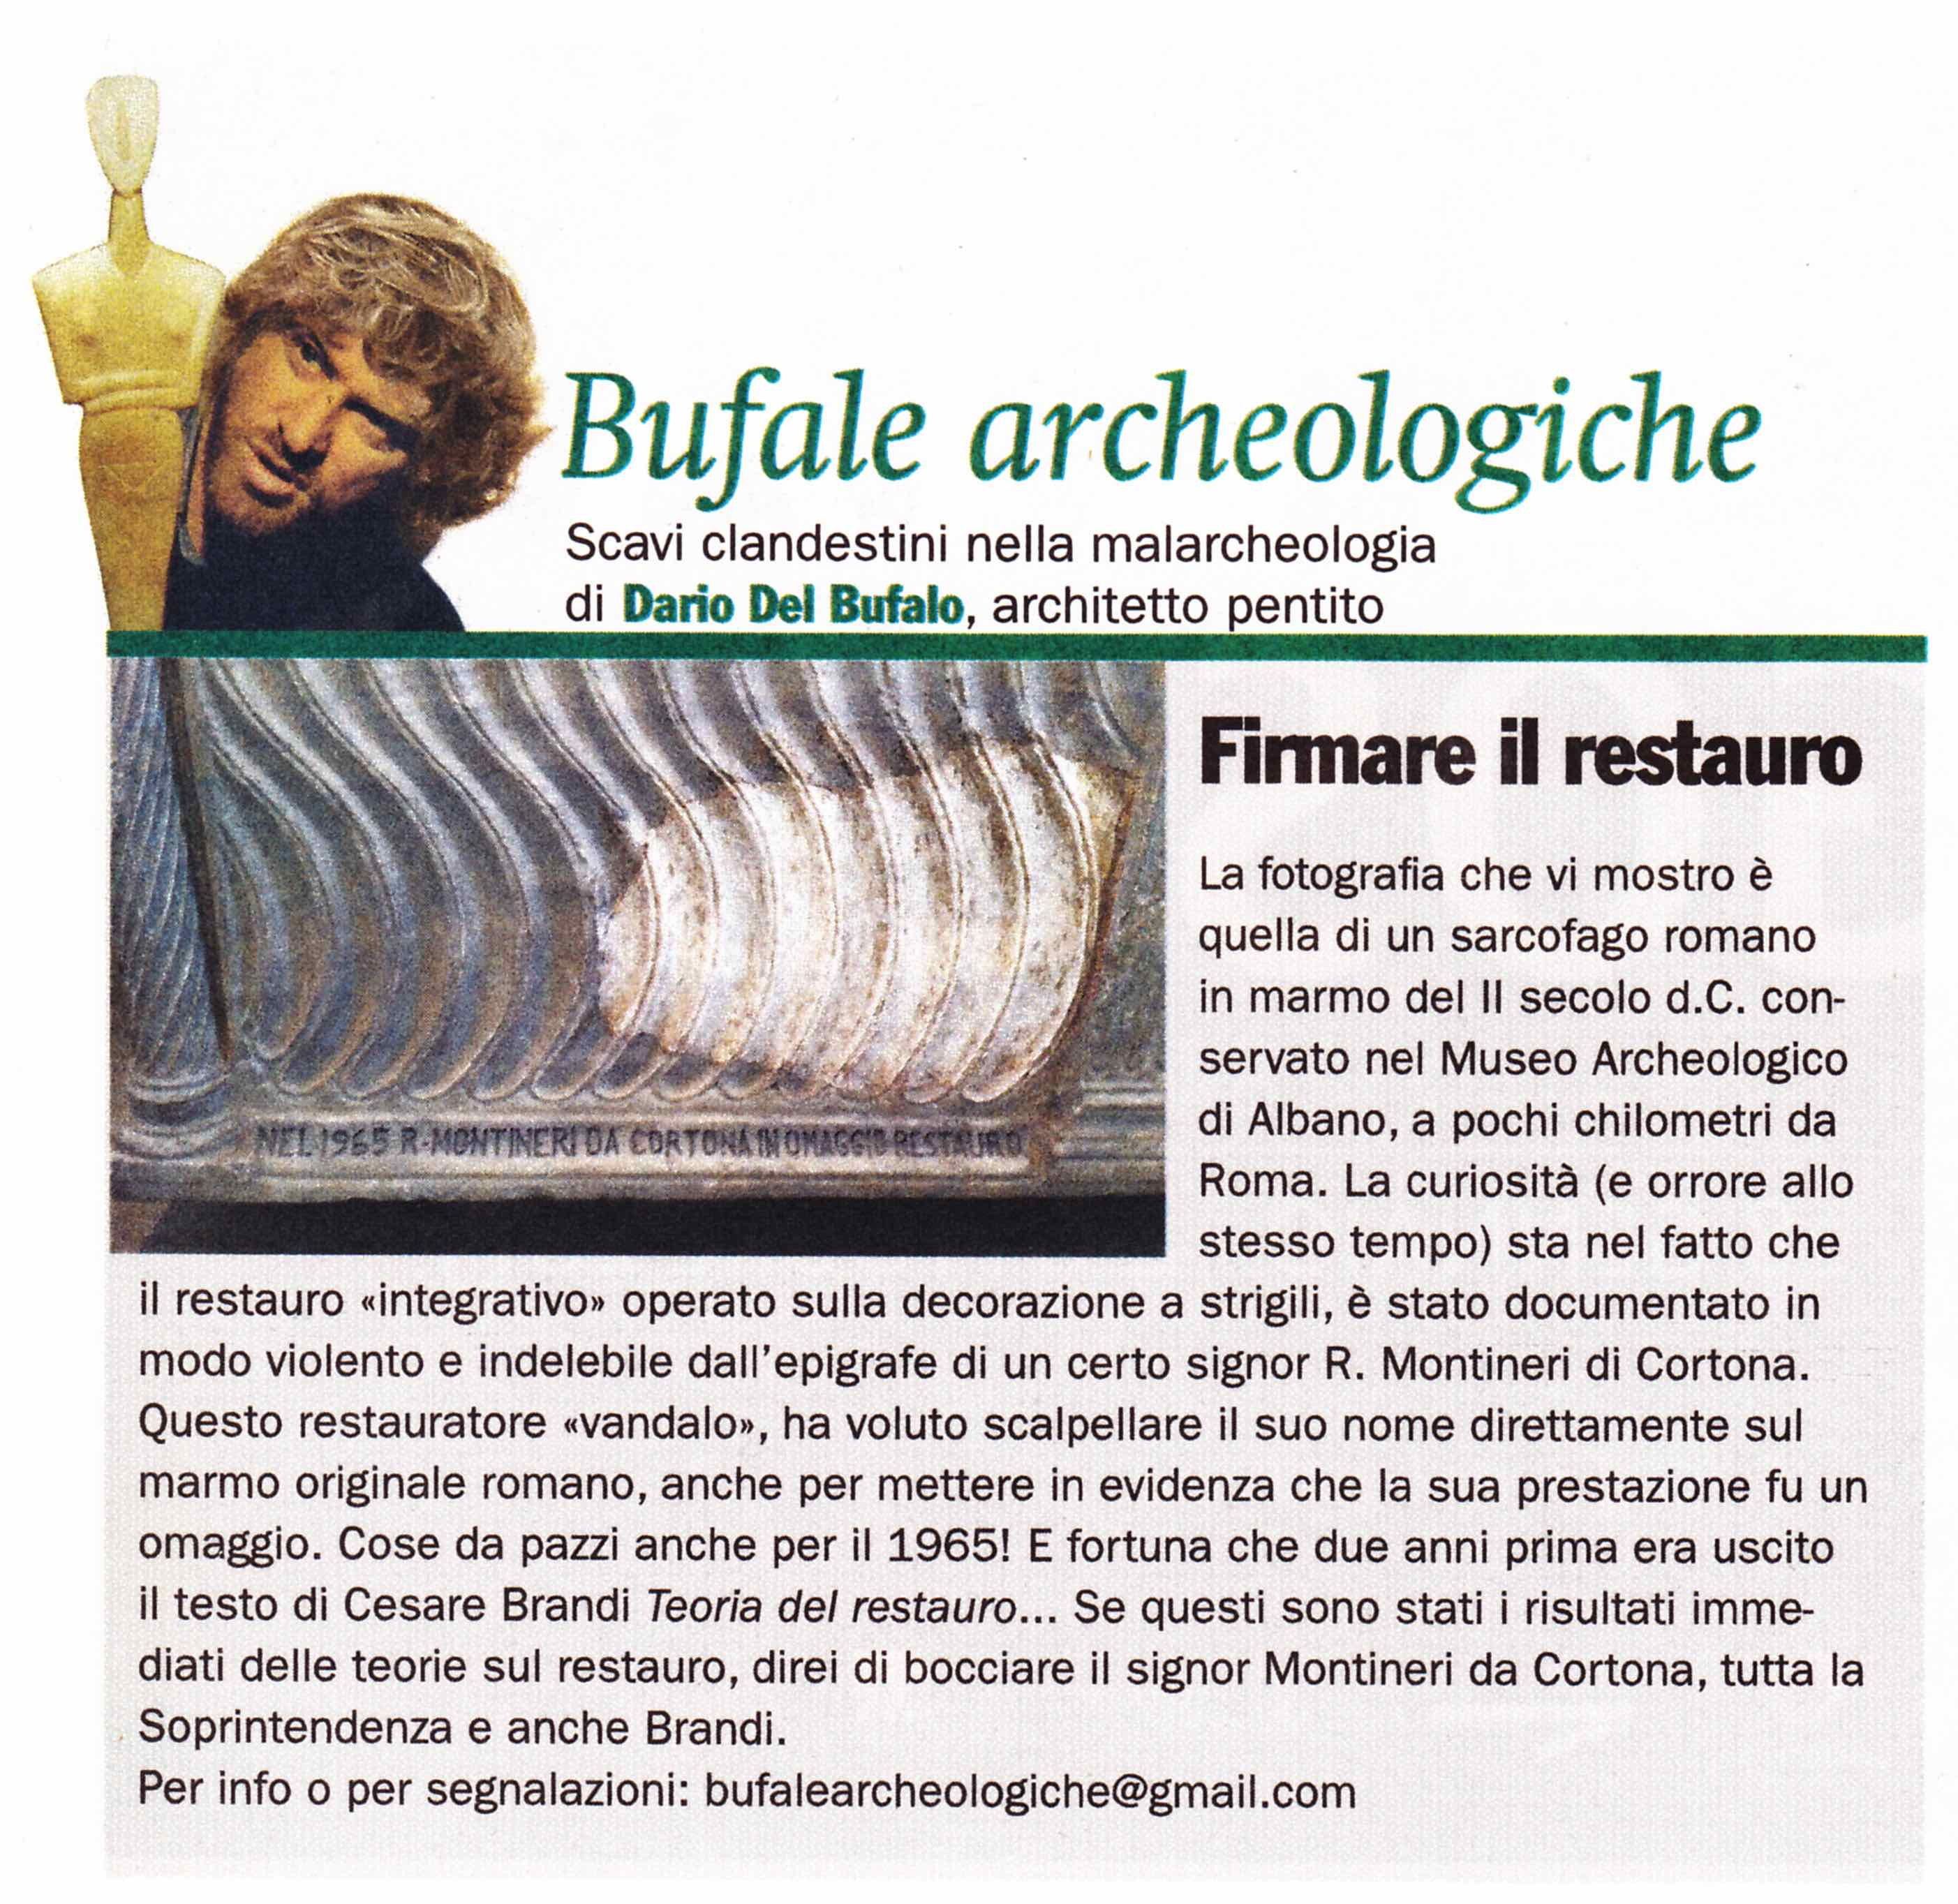 Bufale archeologiche_Febbraio 2015 Dario Del Bufalo